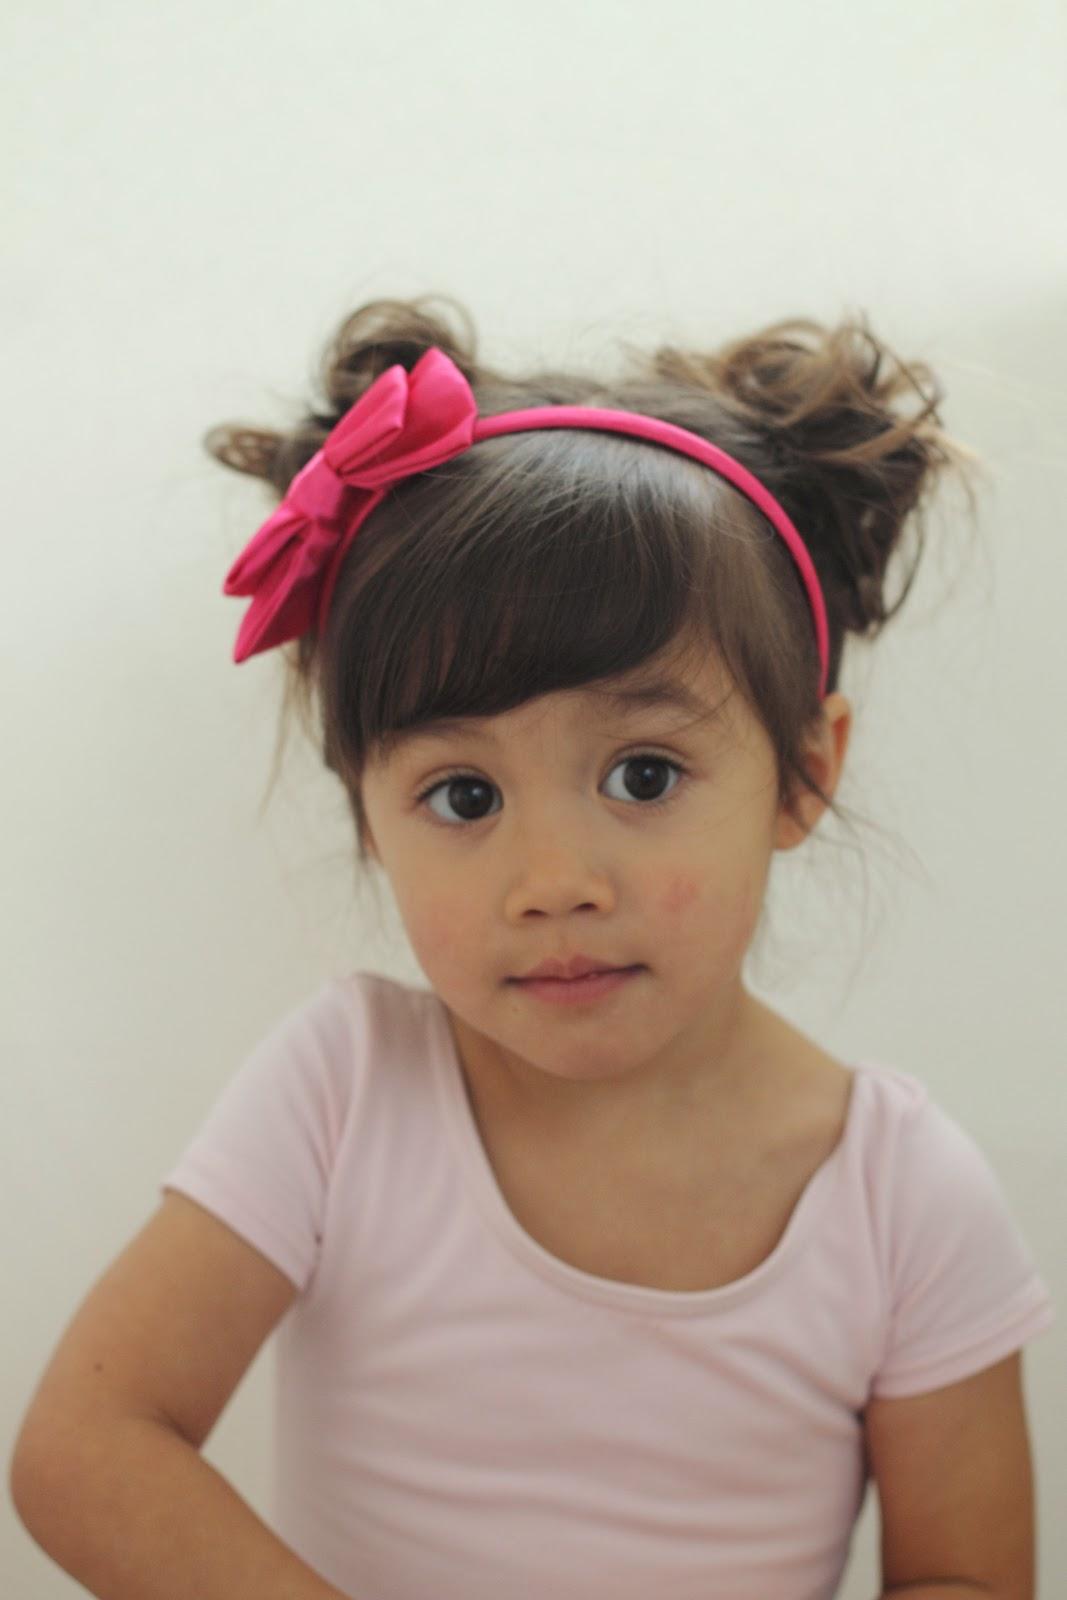 Outstanding Make It Cozee 16 Toddler Hair Styles Short Hairstyles For Black Women Fulllsitofus